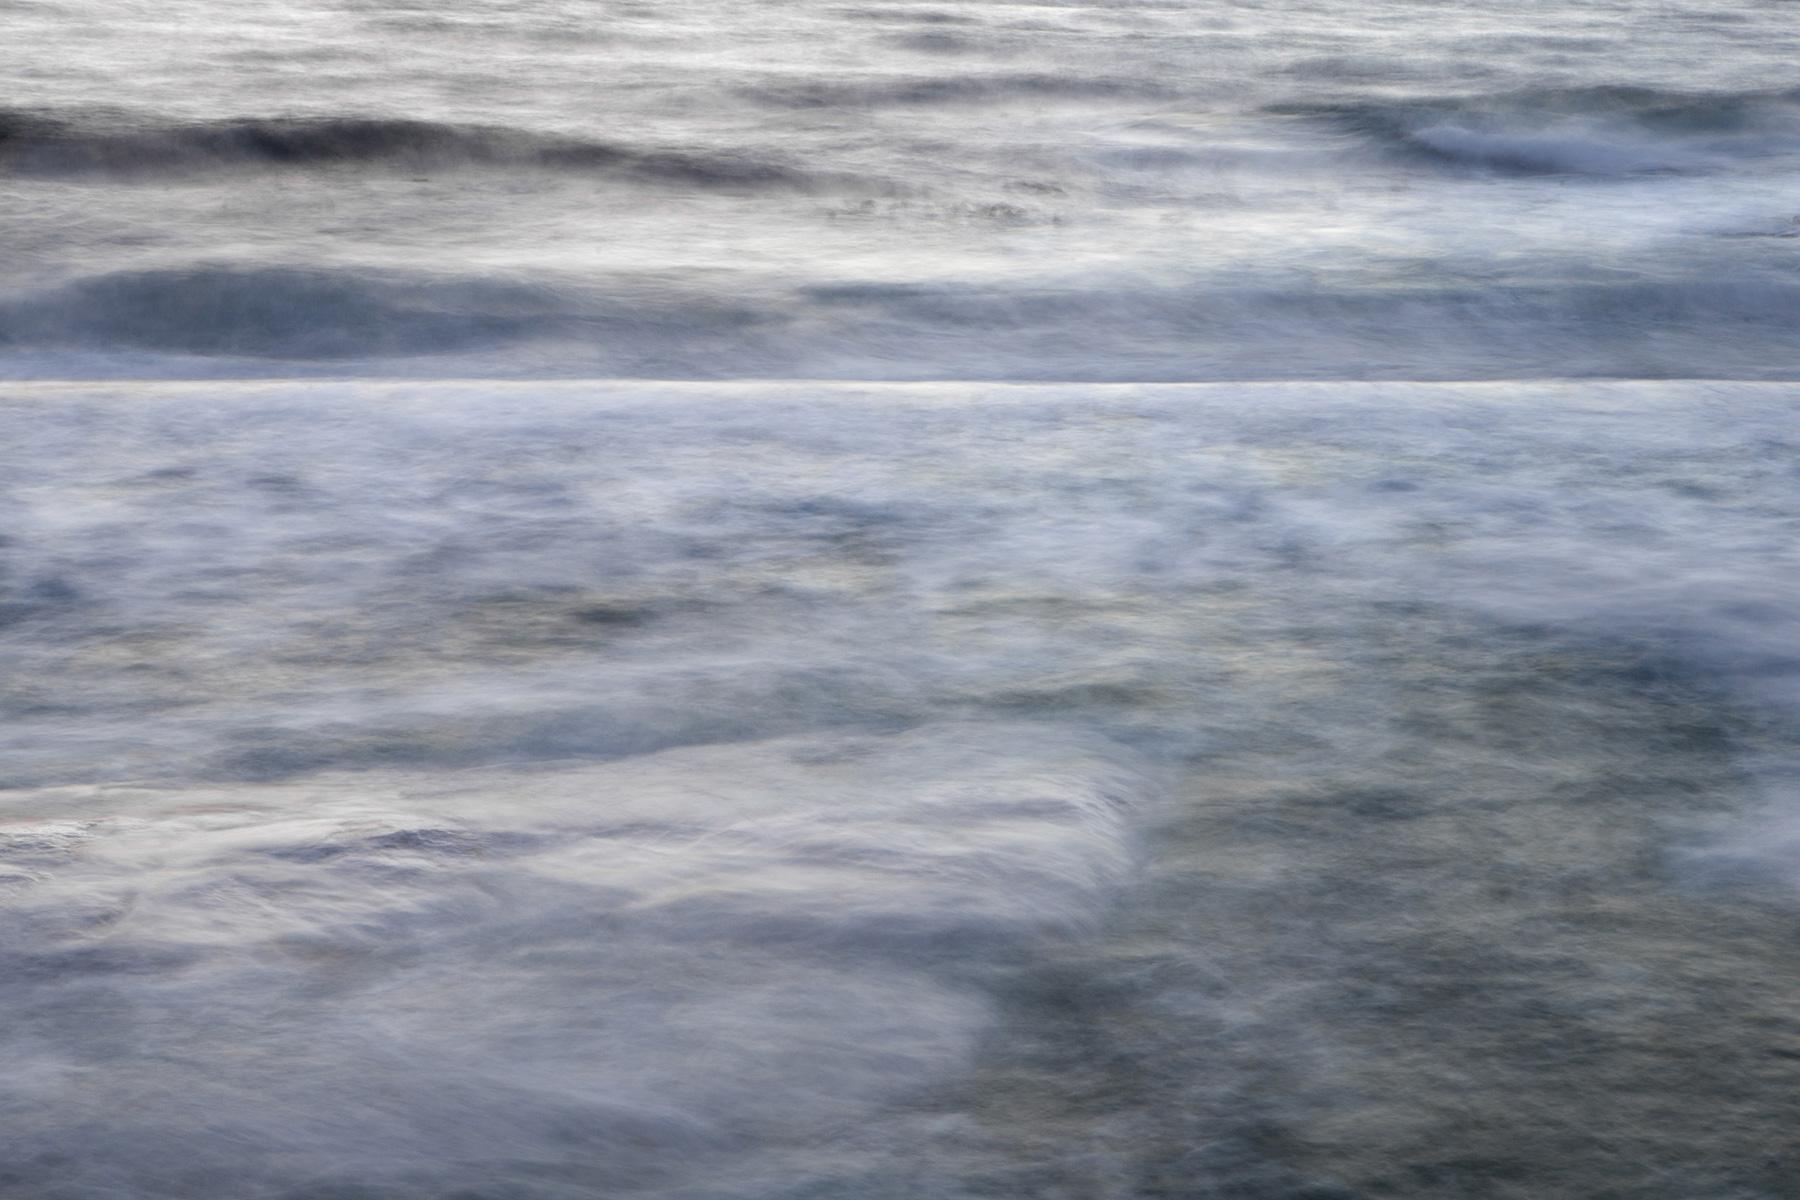 027-Seascape-7-120x90-cm-.jpg